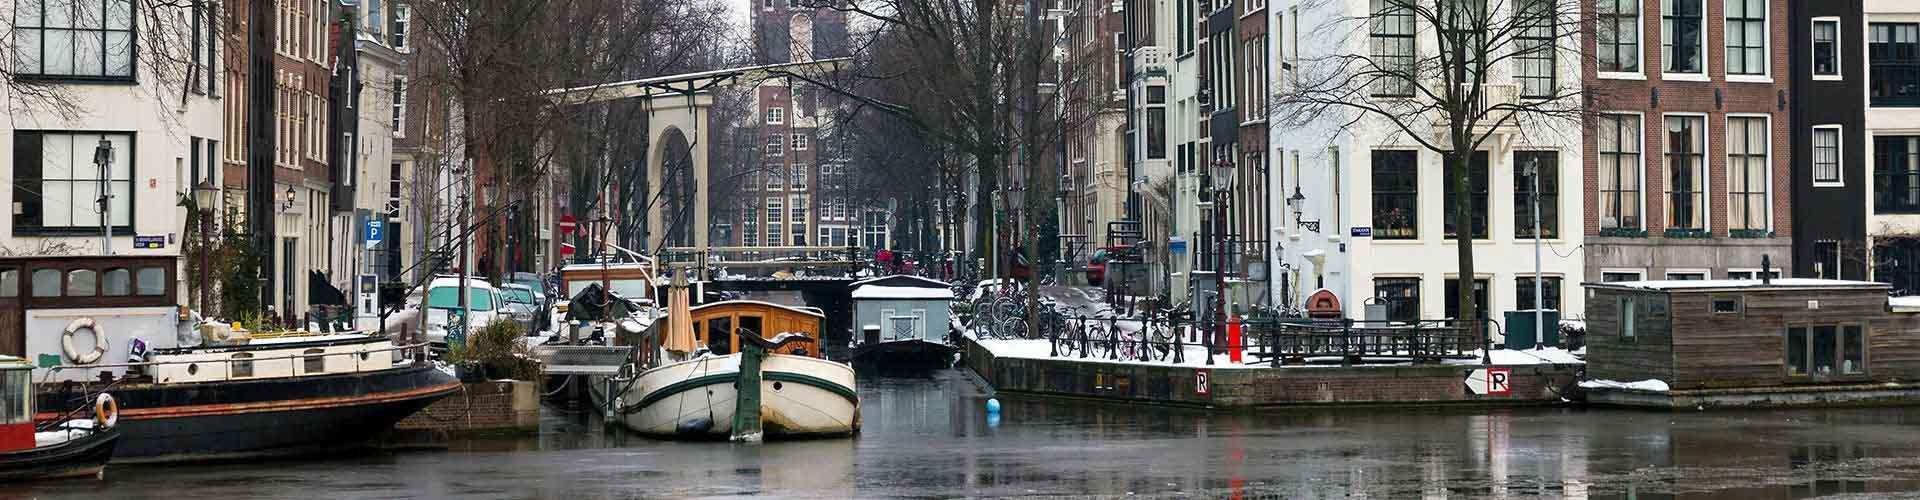 Amsterodam - Hostelů ve čtvrti Amsterdam Oud Zuid. Mapy pro Amsterodam, fotky a recenze pro každý hostel v Amsterodam.